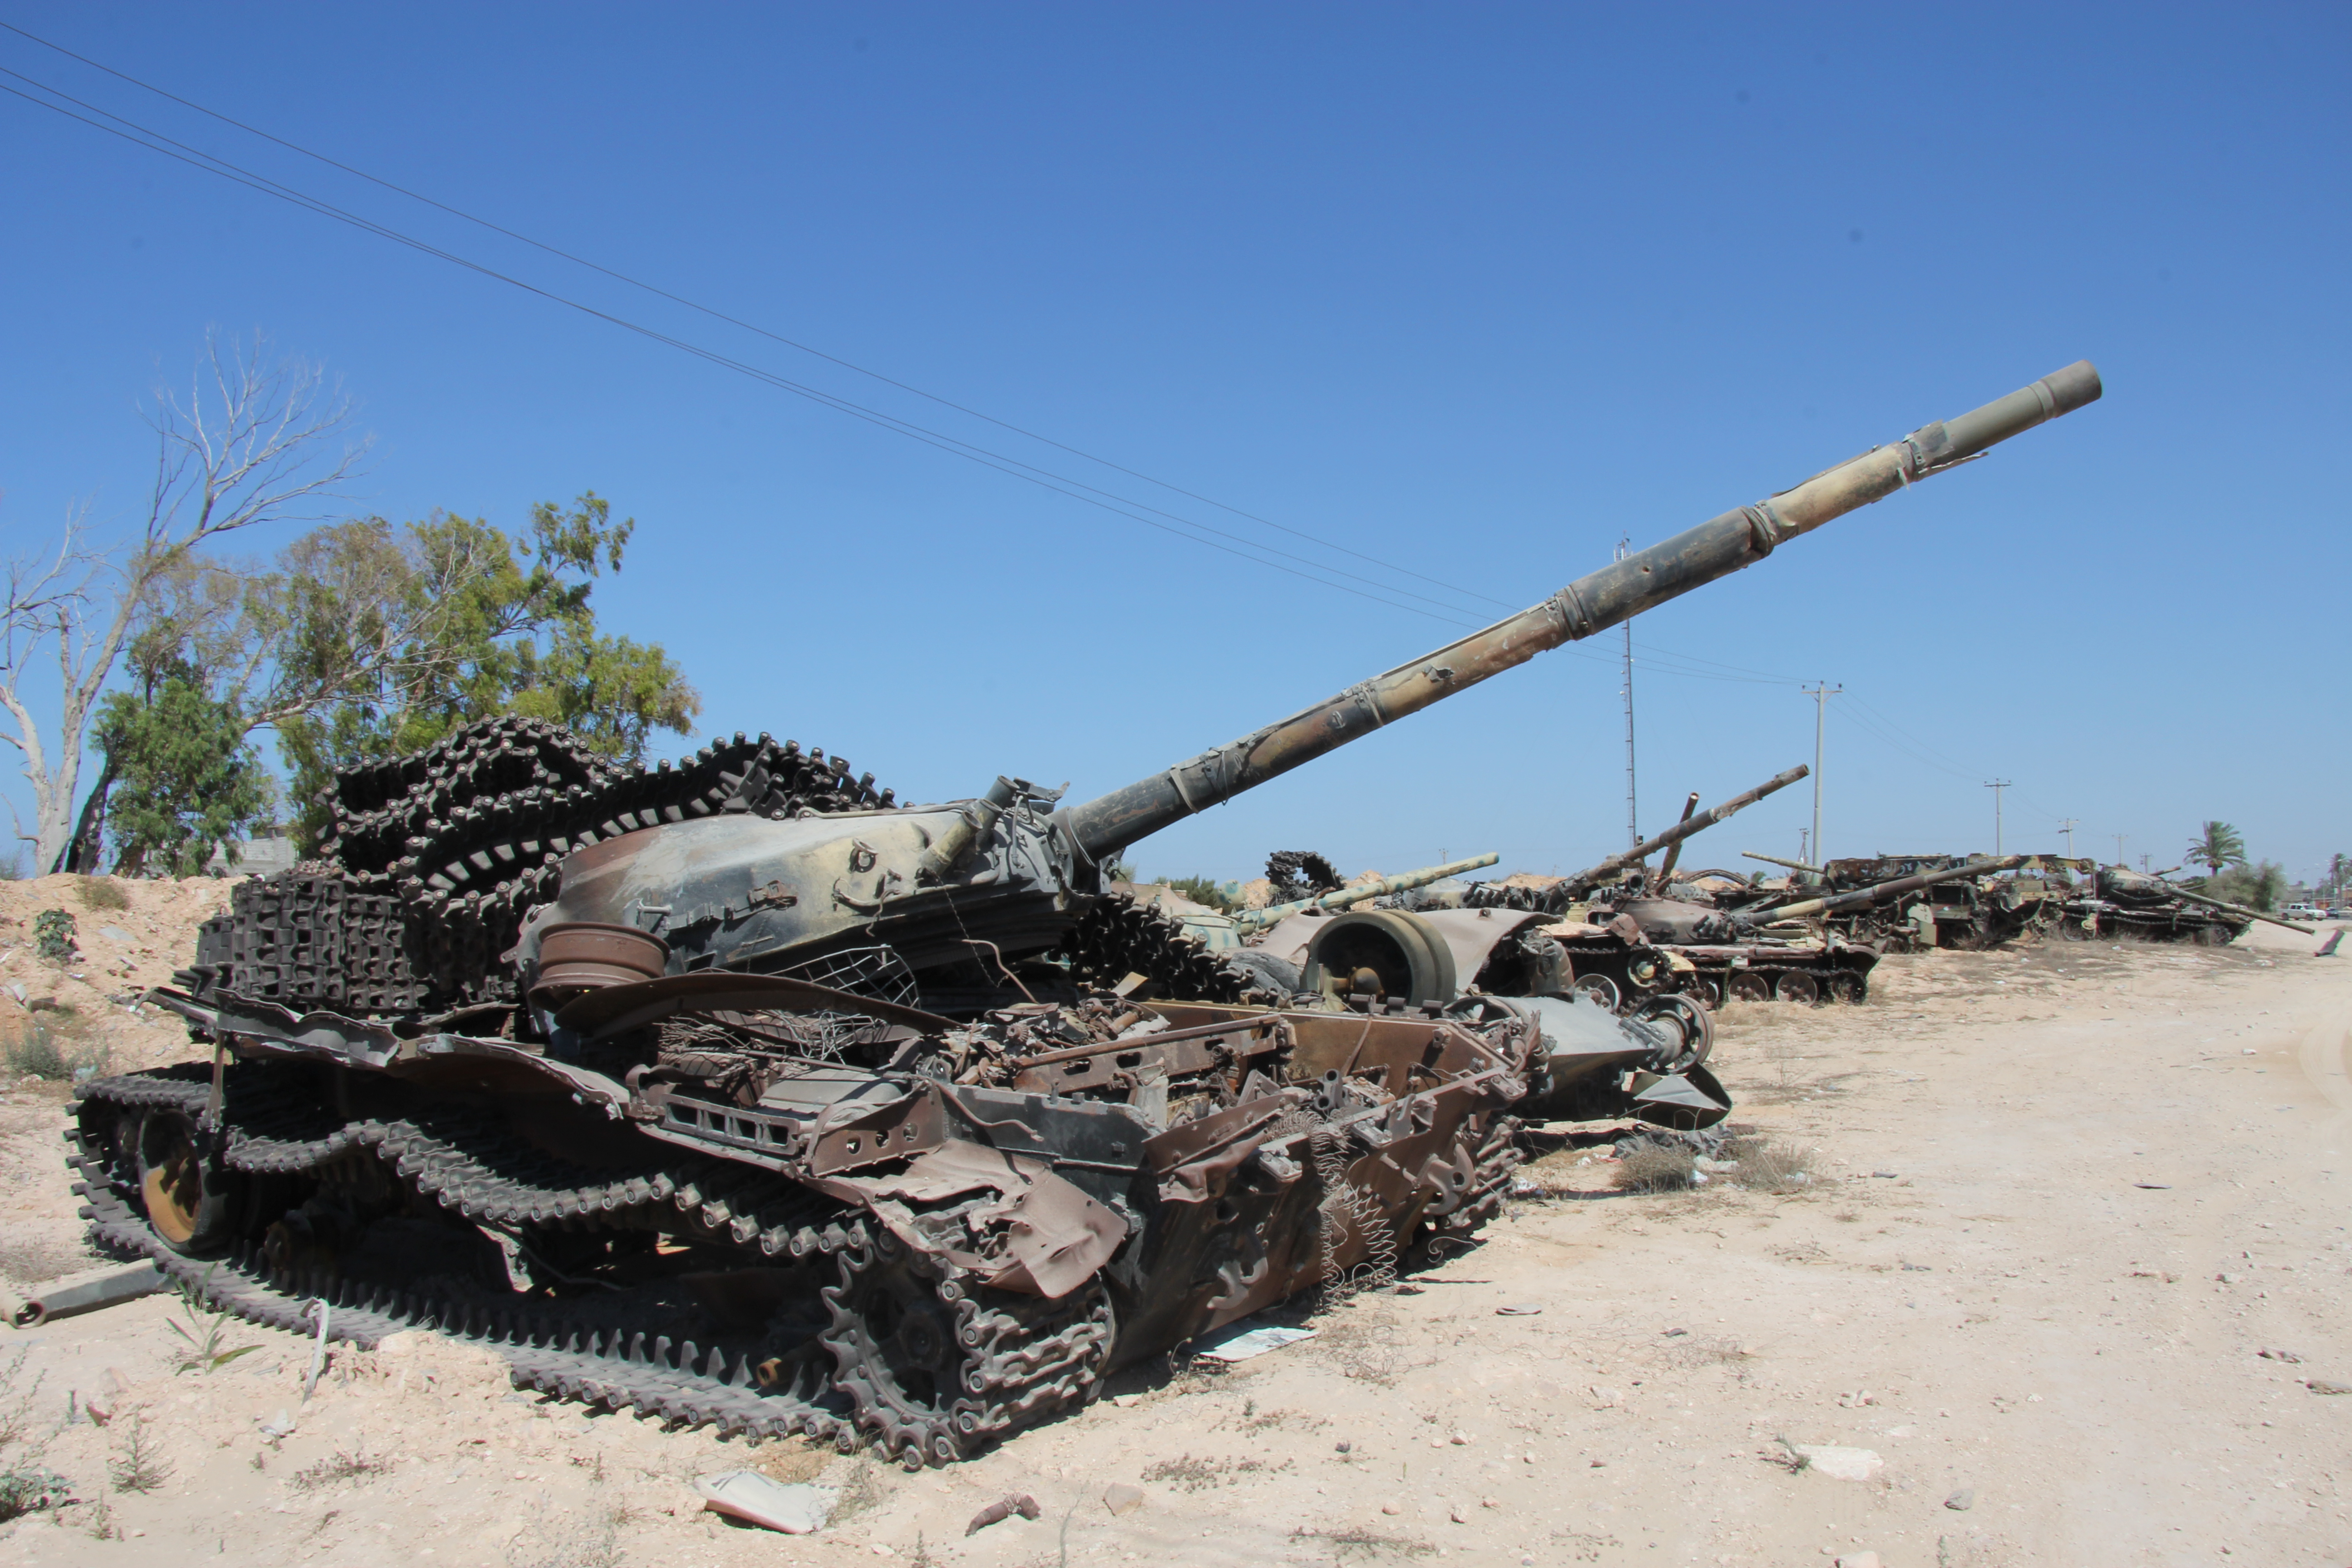 Depiction of Guerra de Libia de 2011